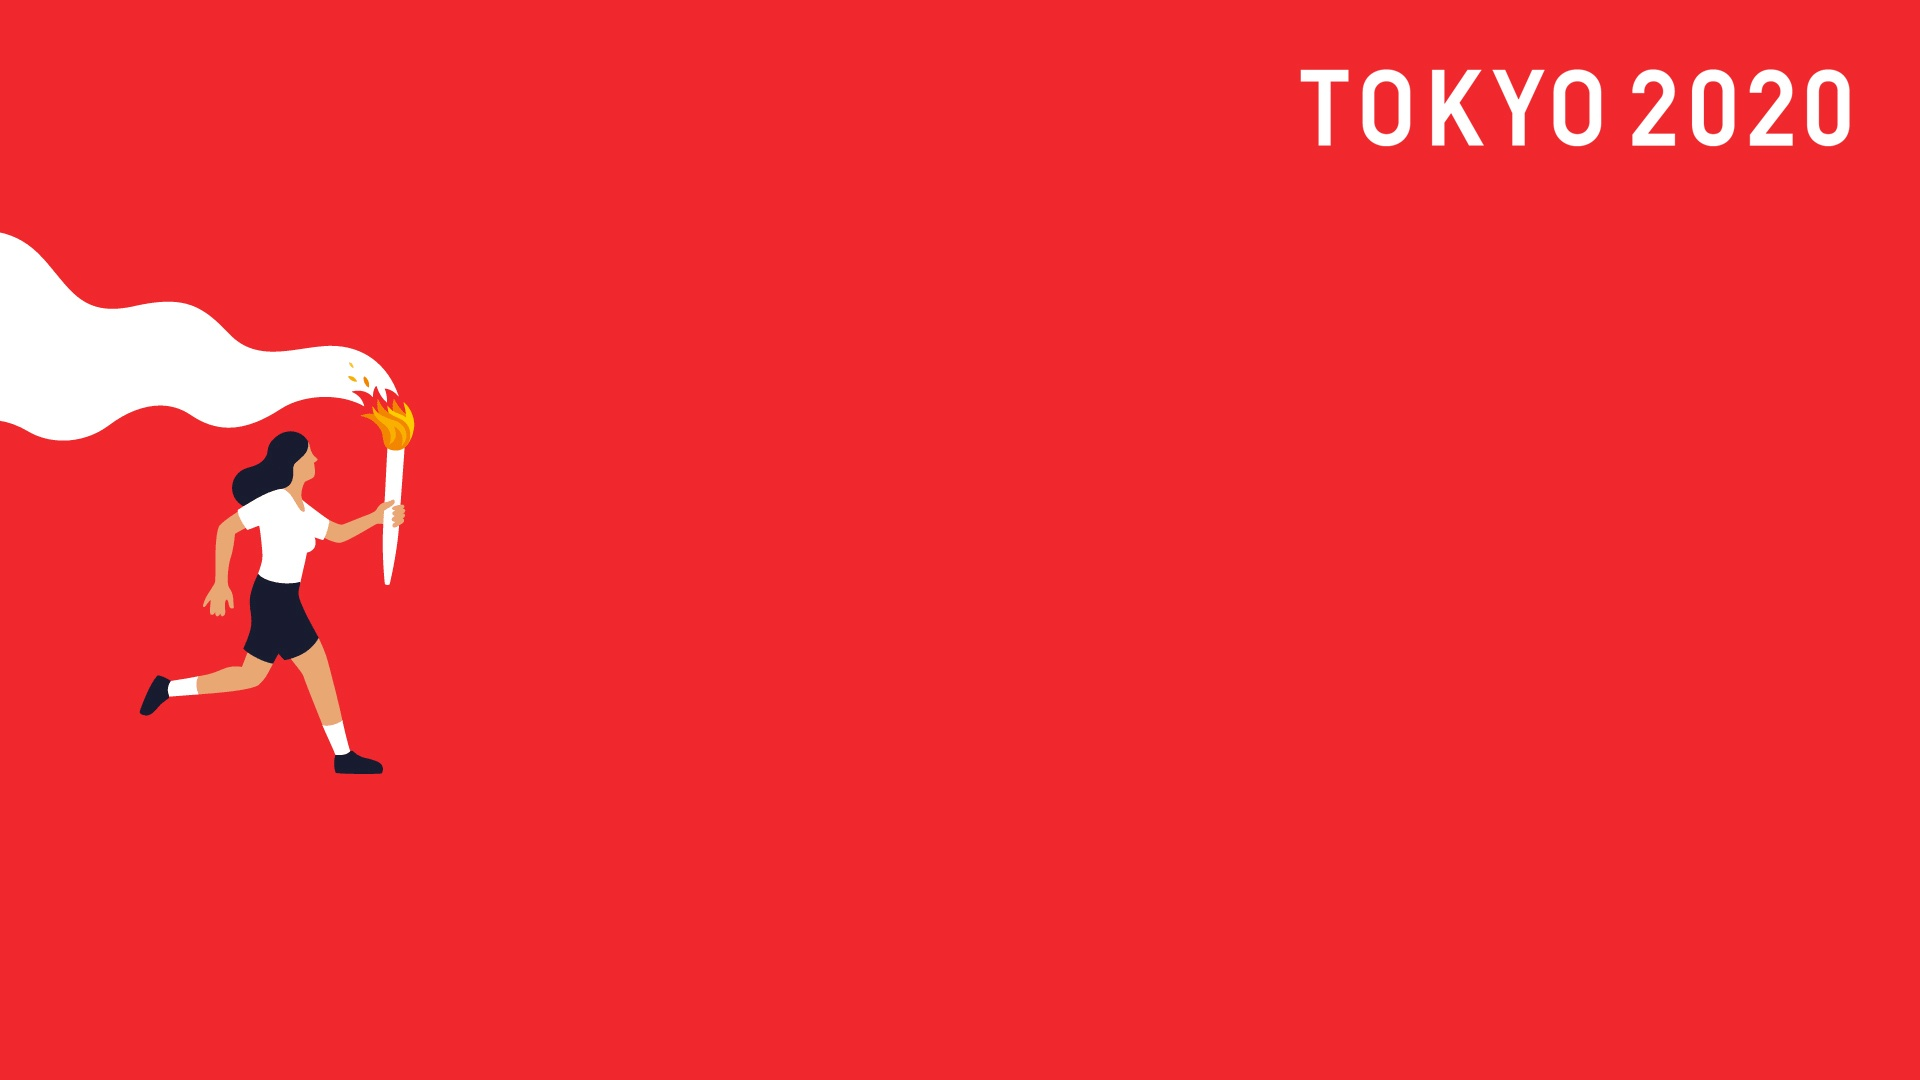 Tokyo 2020 Olympics free background